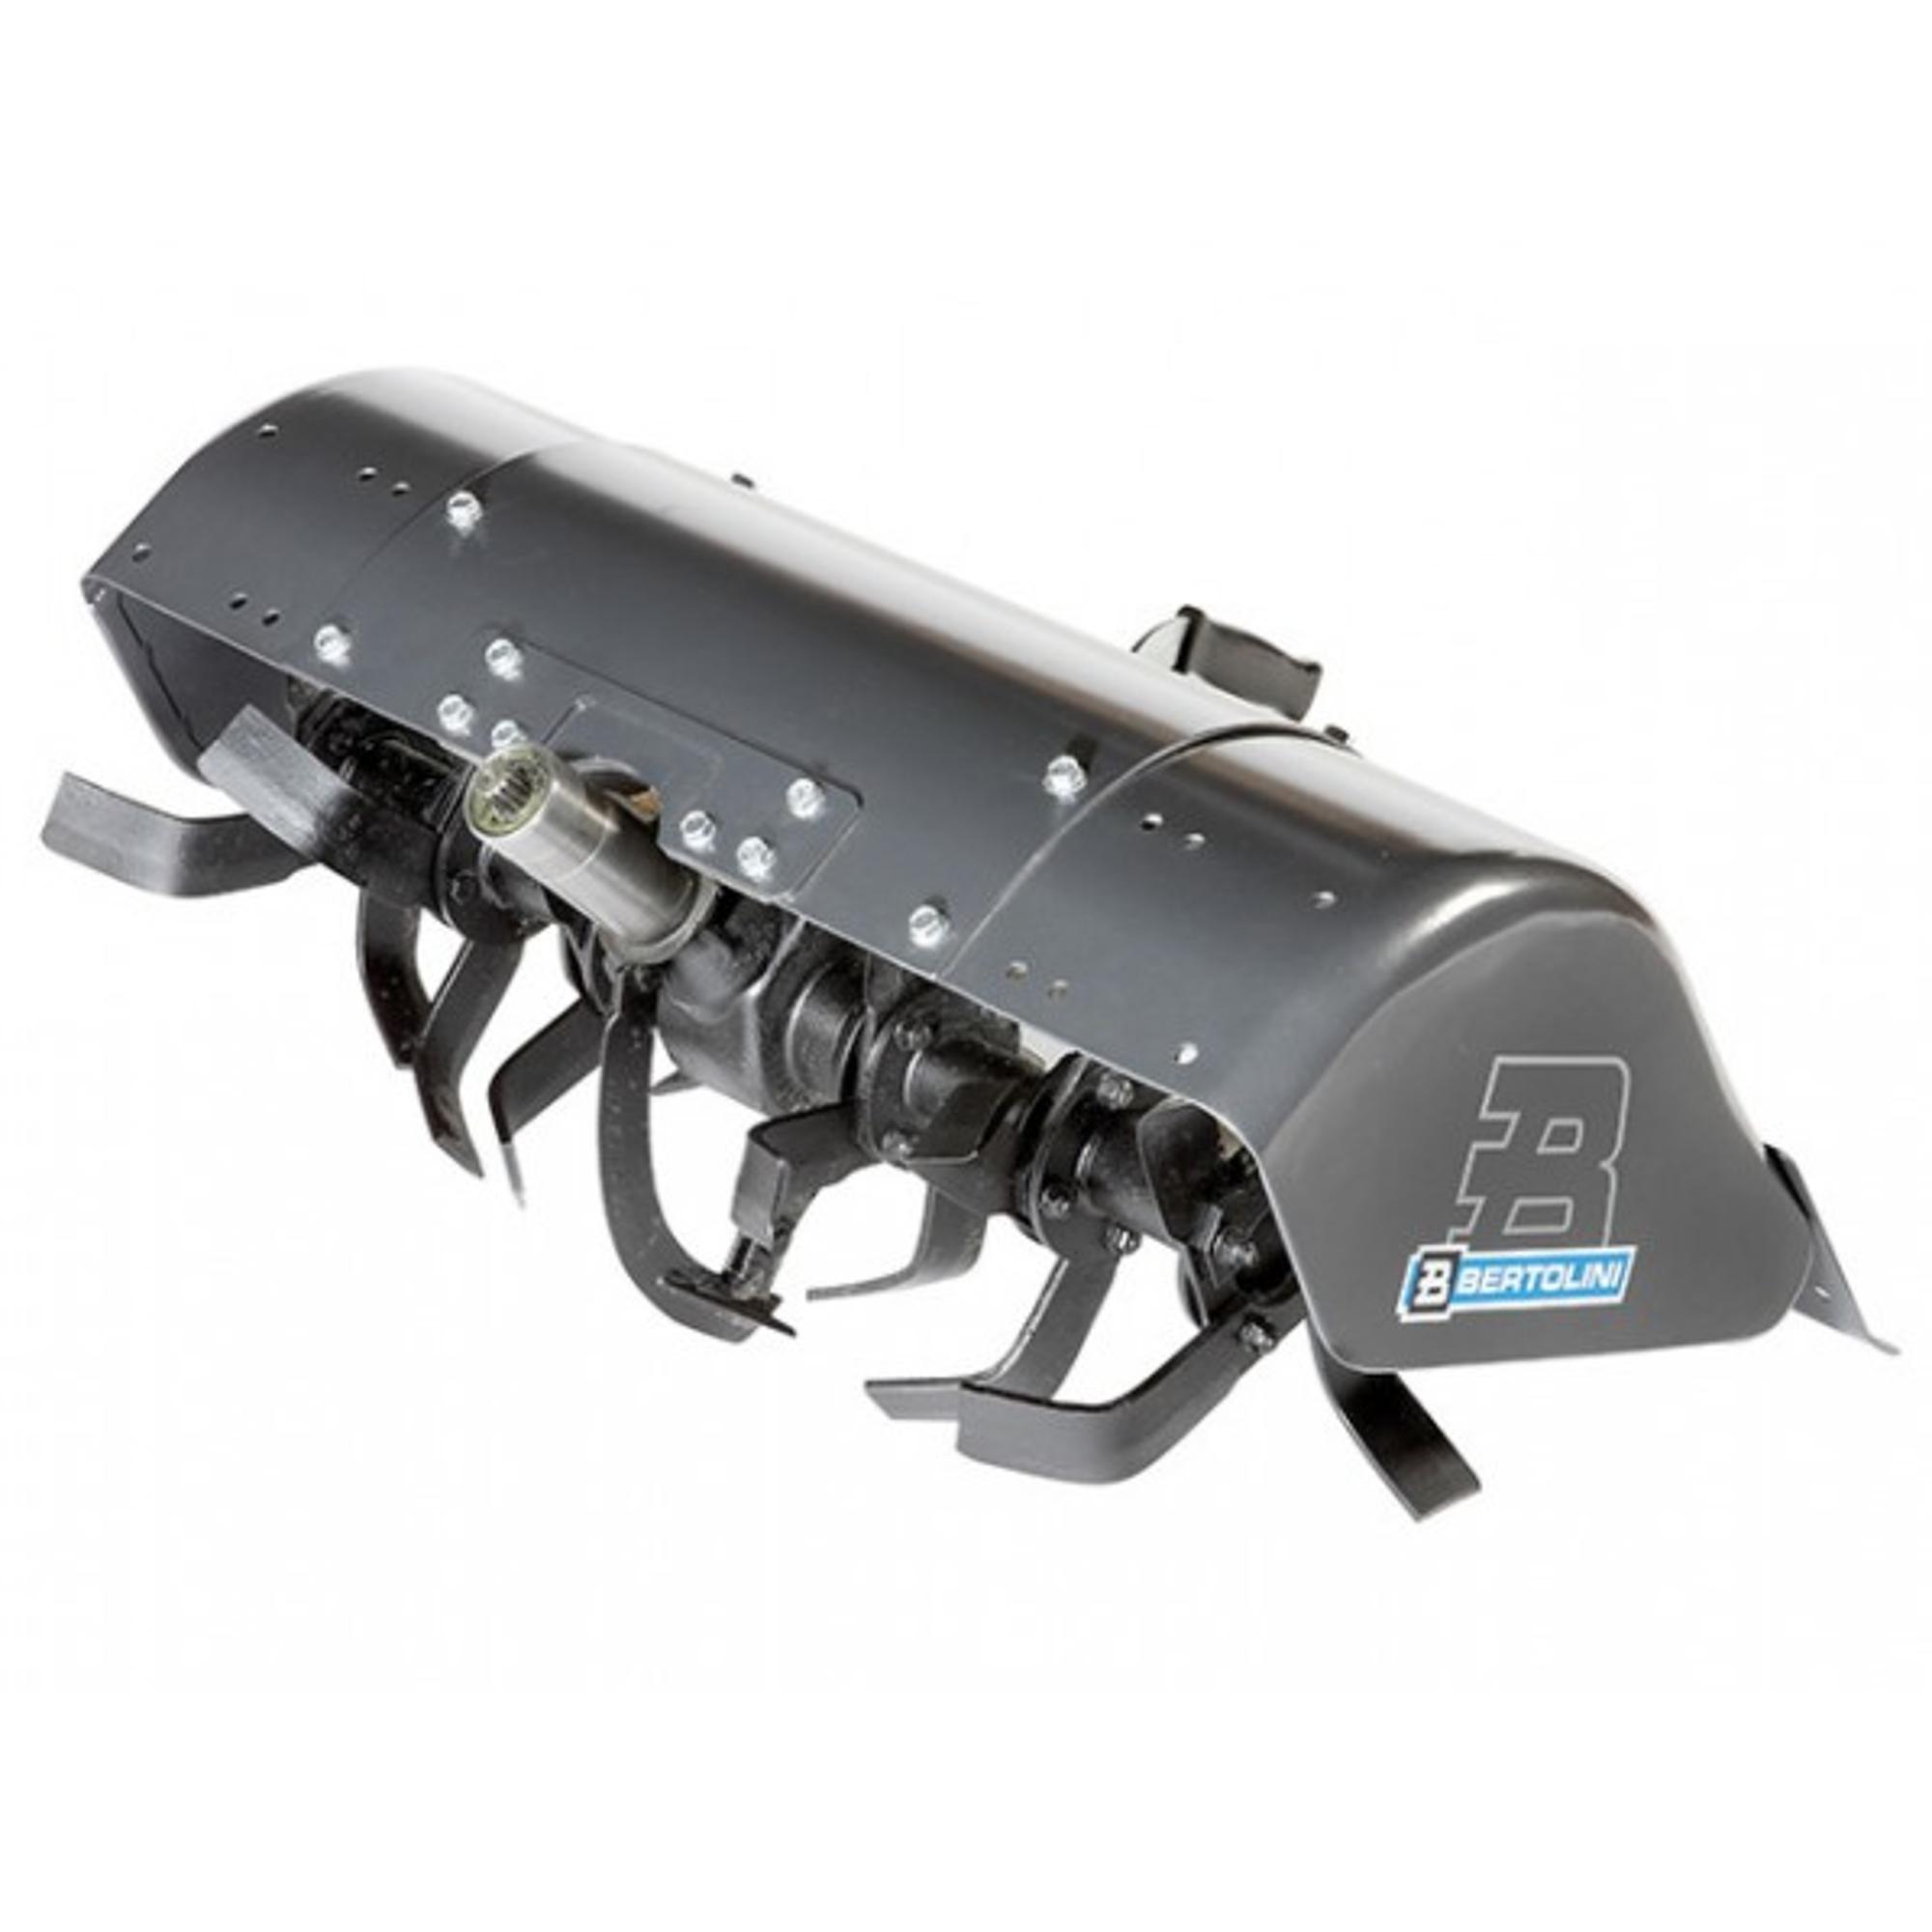 Bertolini Rotor 60 cm, 16 késes quick fit-tel motoros kultivátorhoz 69219089